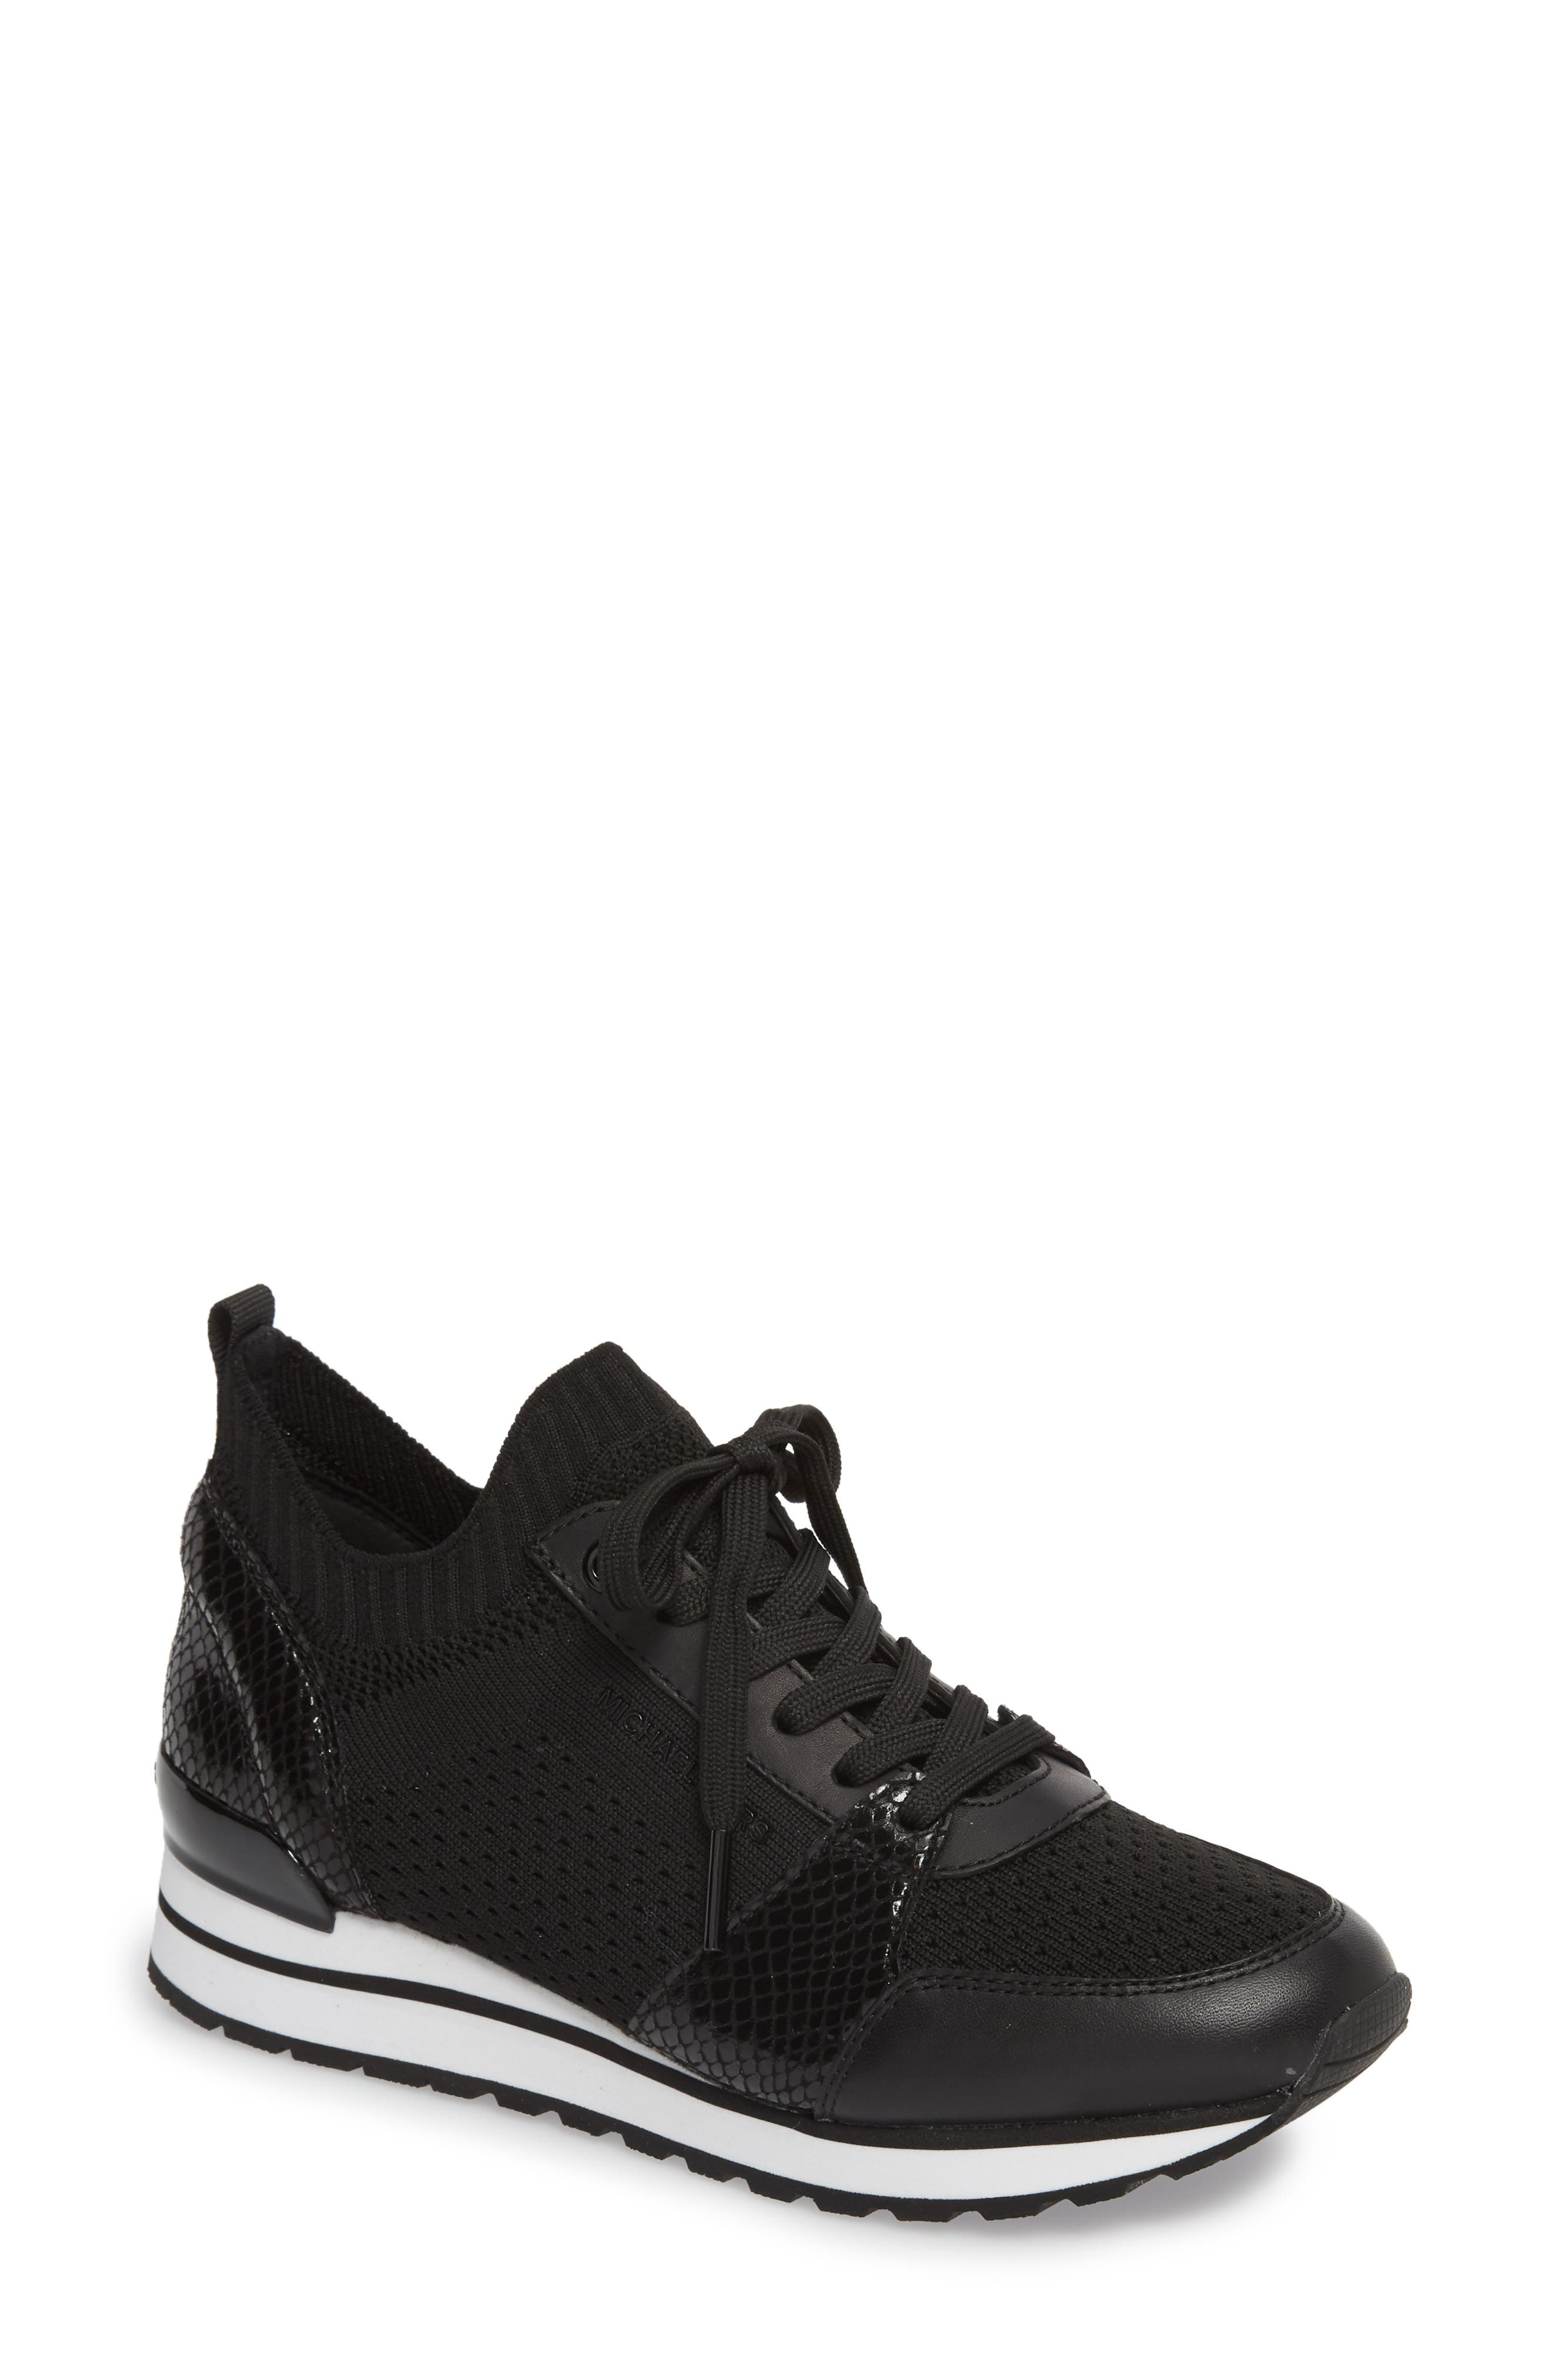 Billie Perforated Sneaker,                             Main thumbnail 1, color,                             002